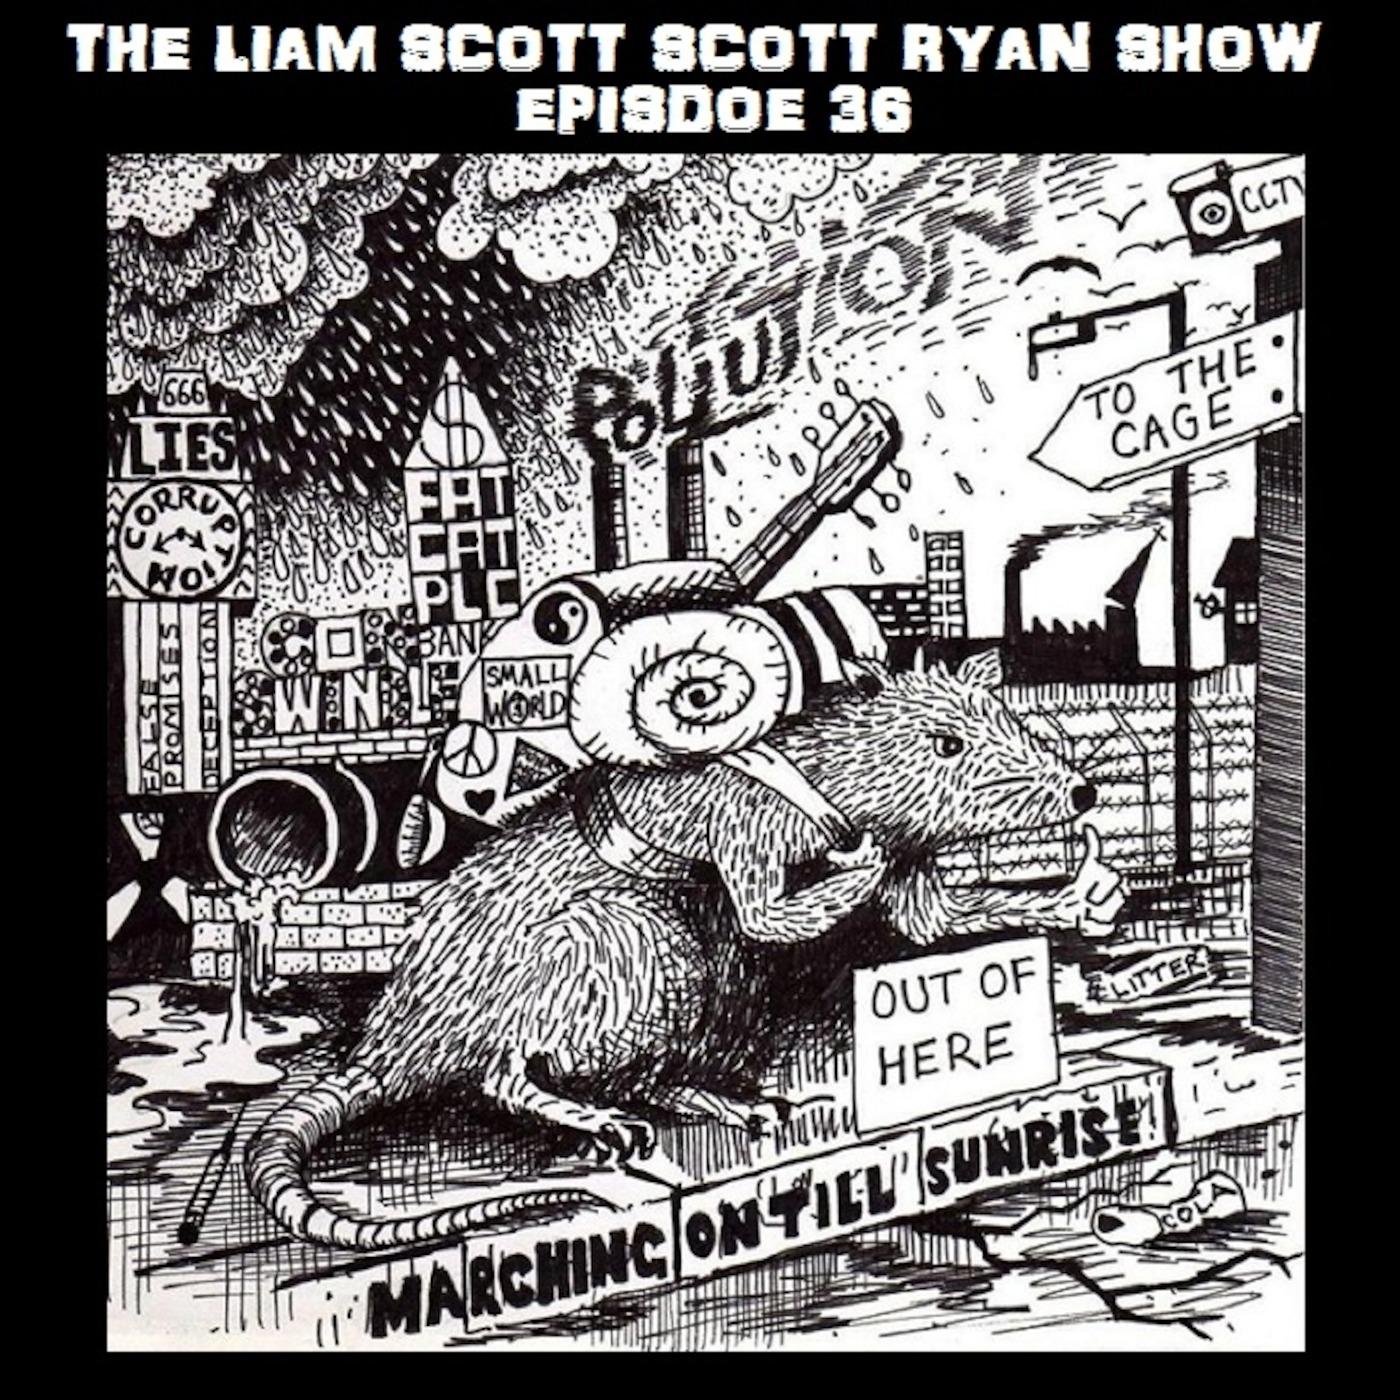 Liam Scott Scott Ryan Show